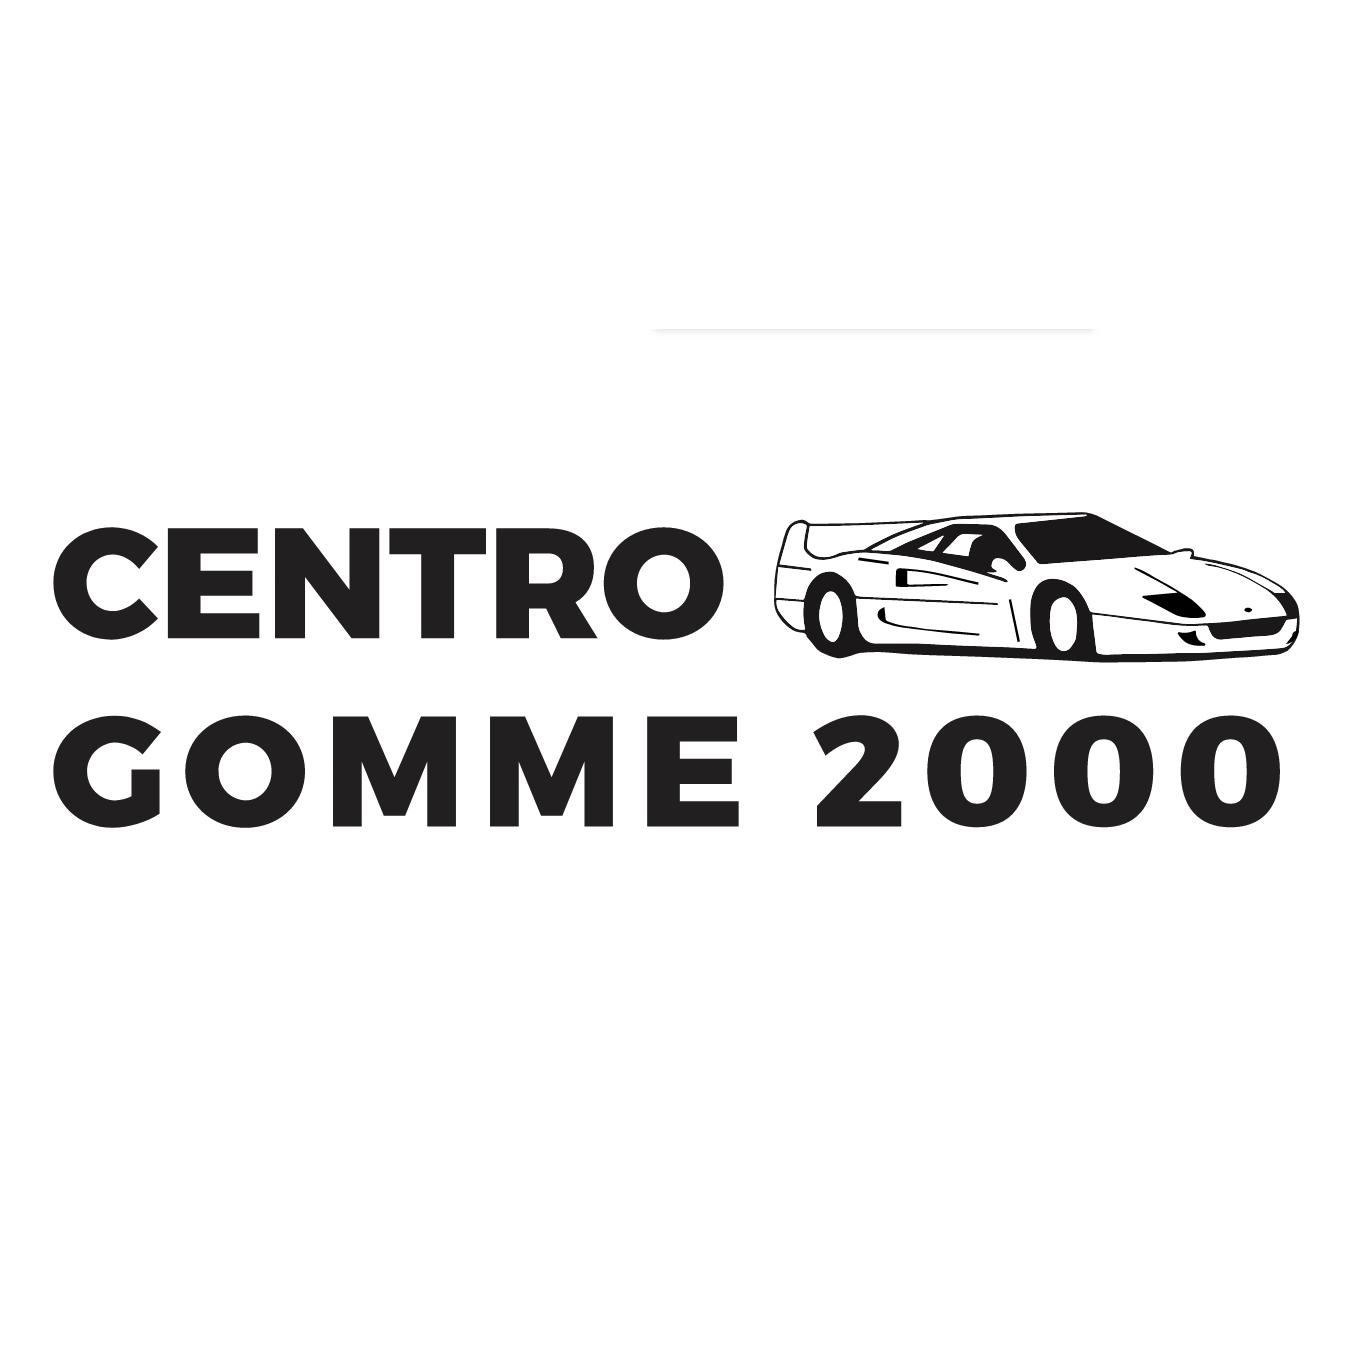 Centro Gomme 2000